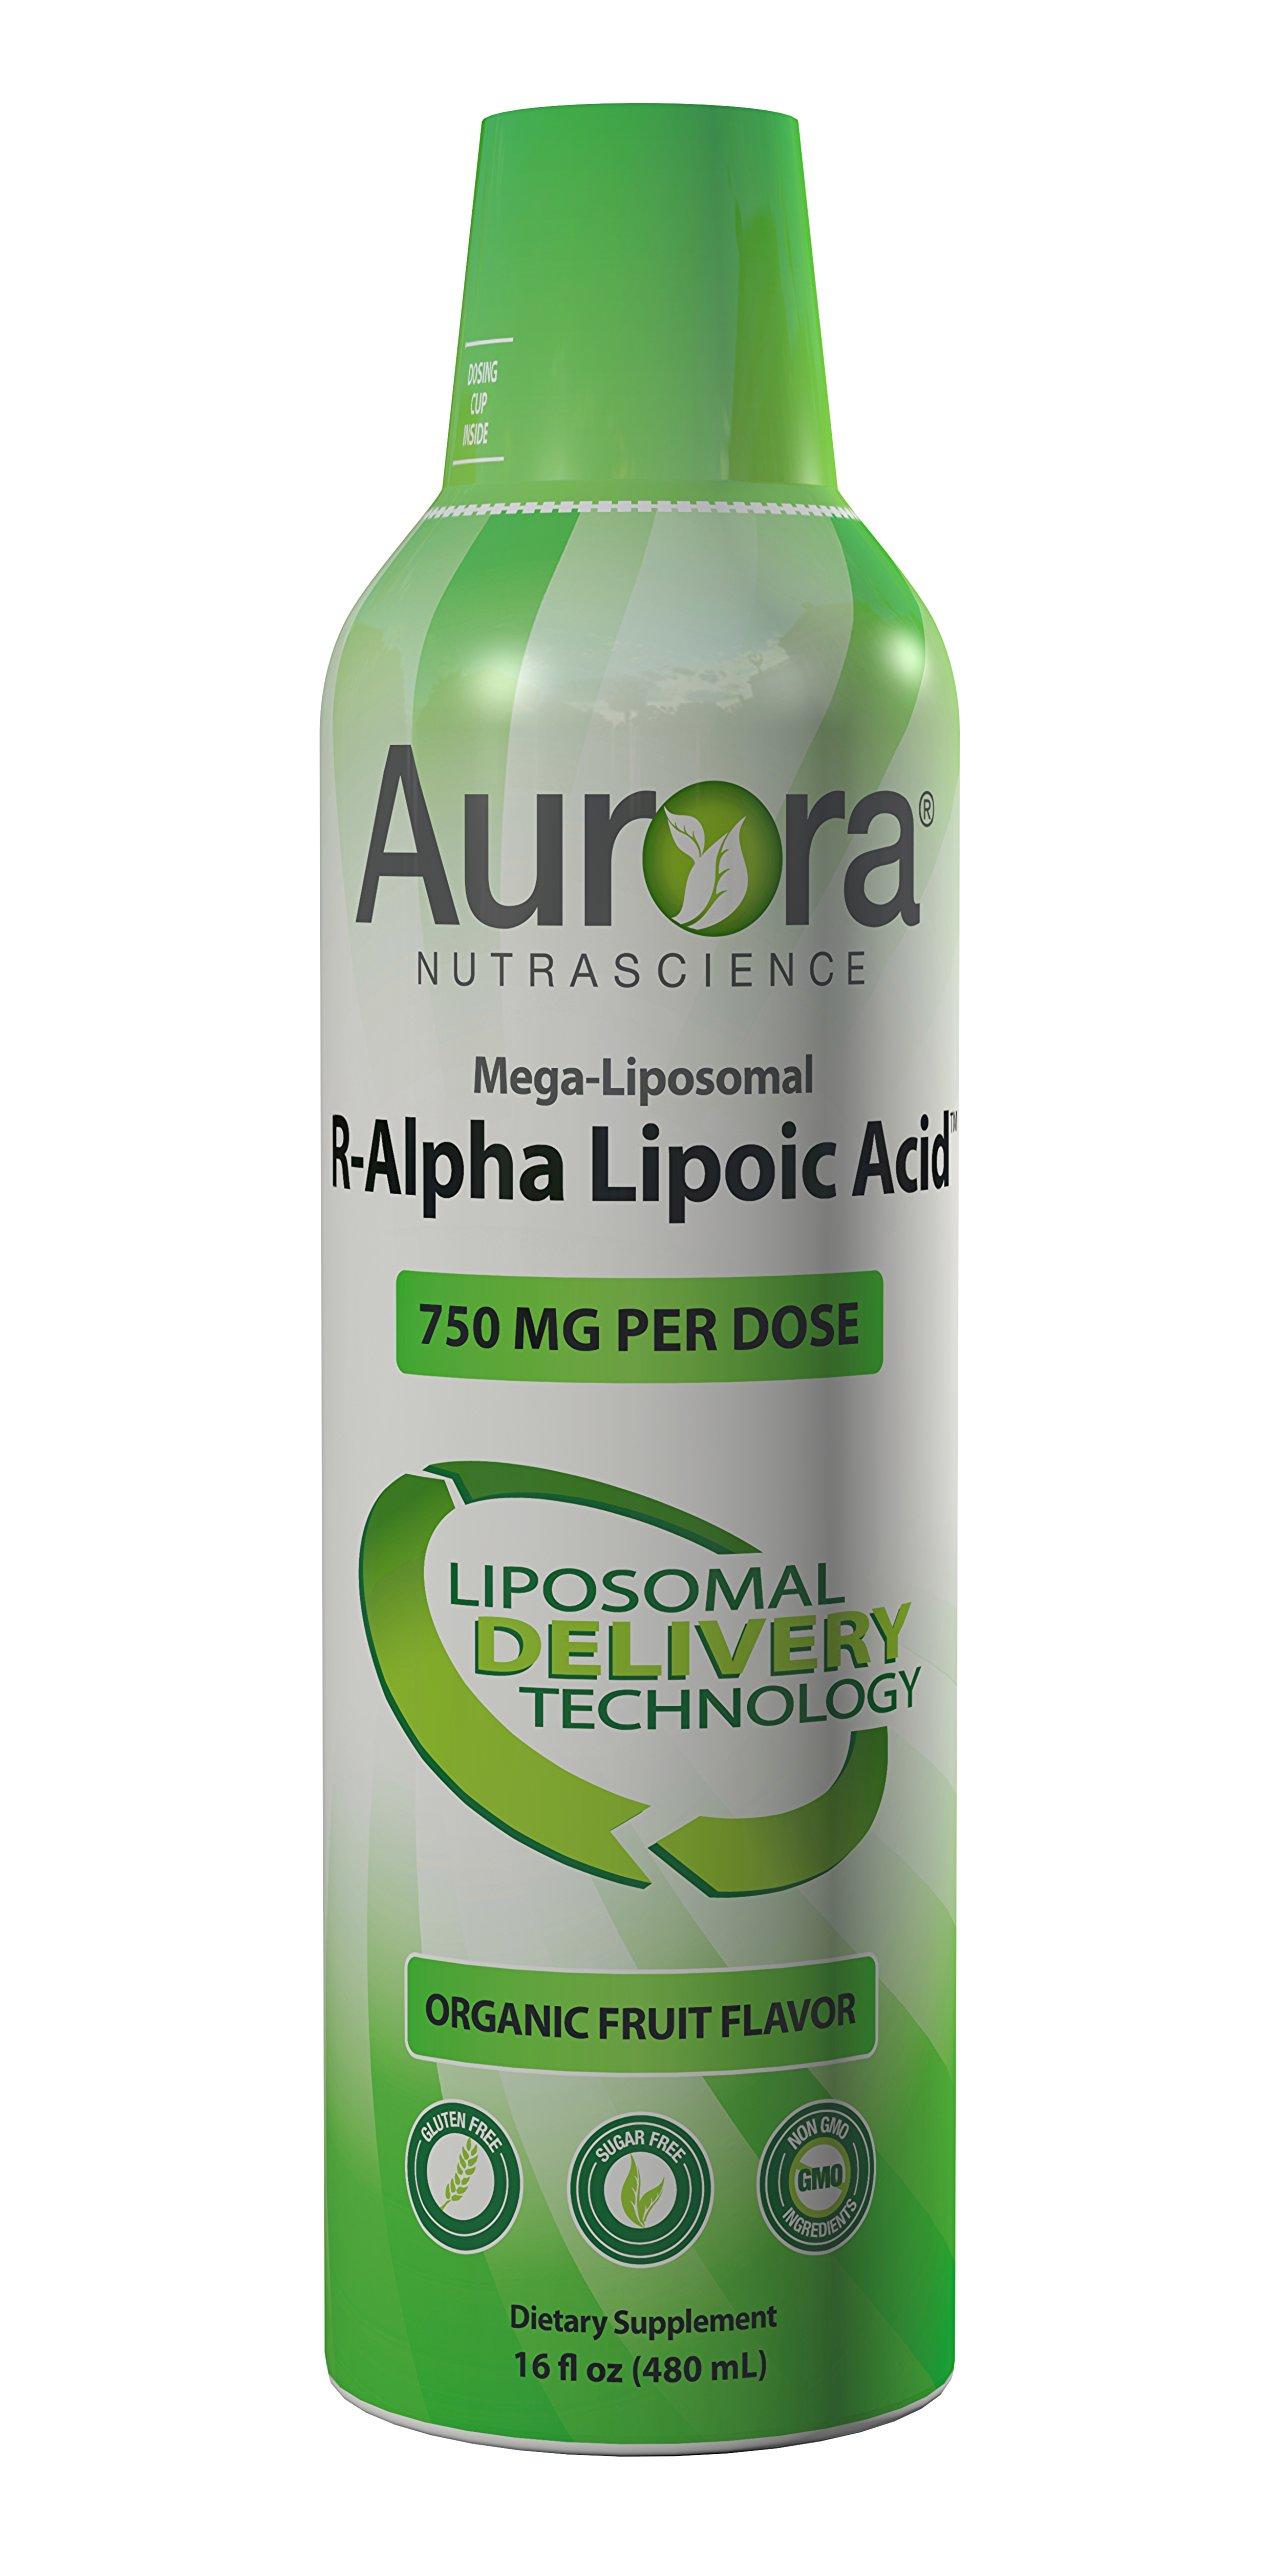 Aurora Nutrascience Mega Liposomal R-Alpha Lipoic Acid 16 oz